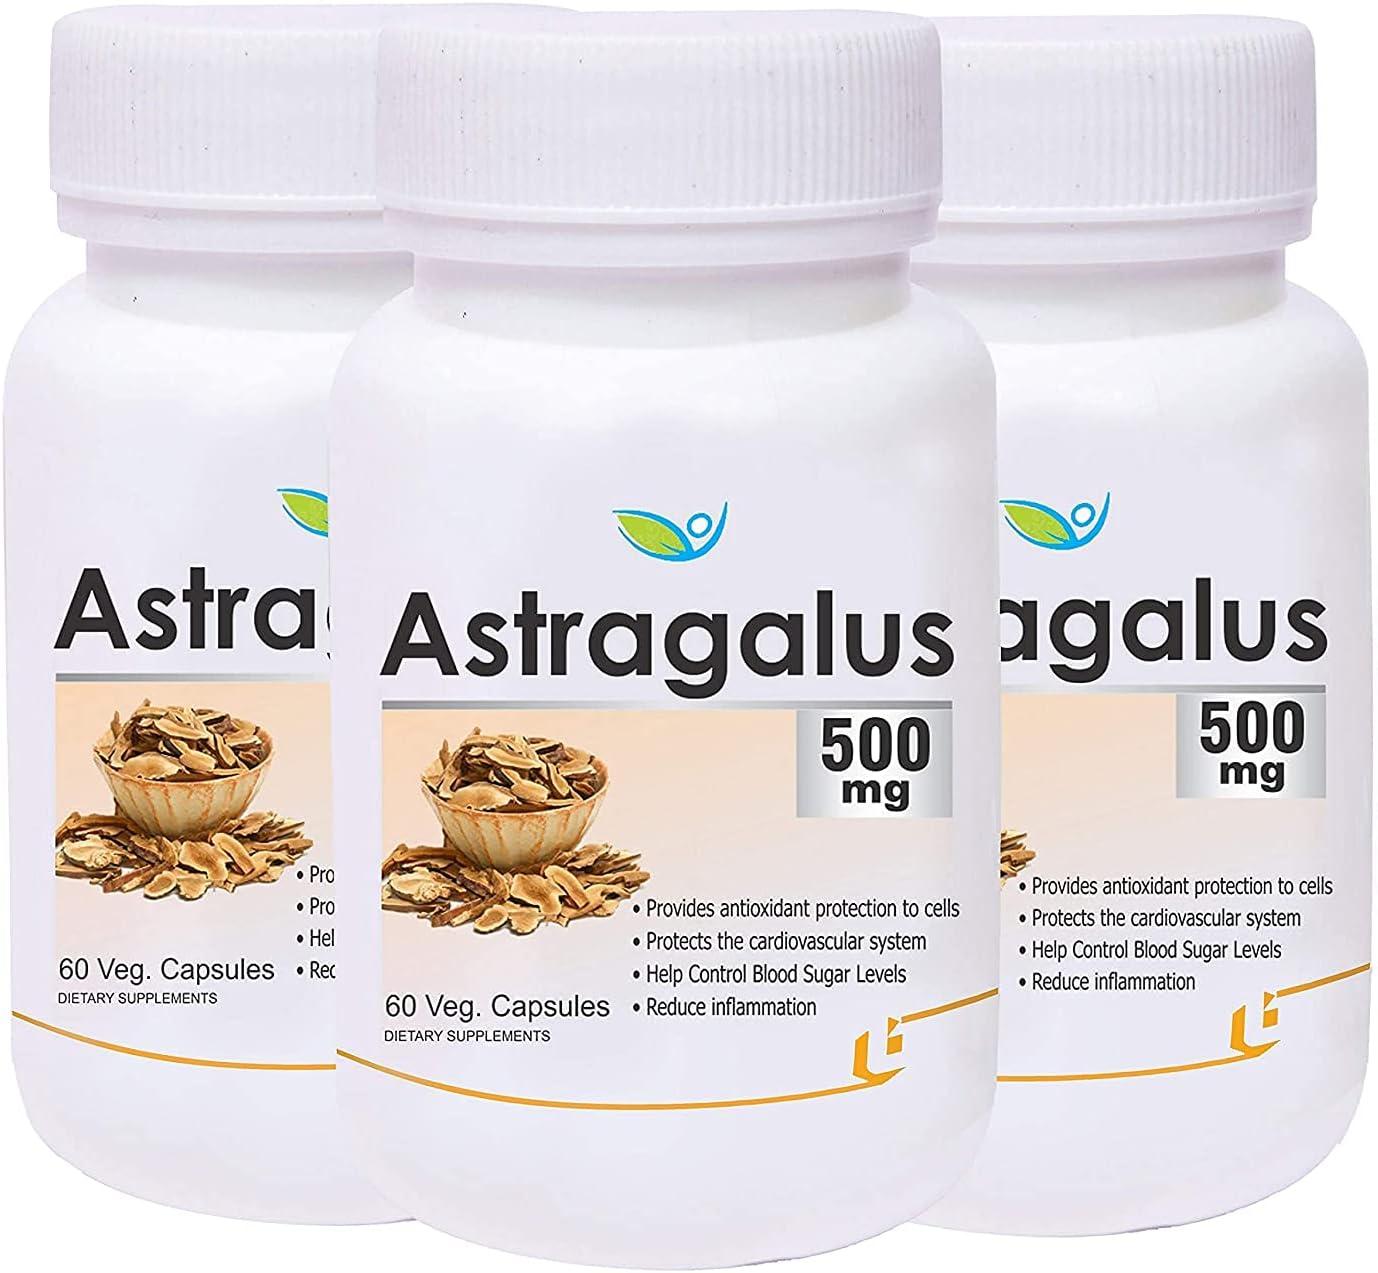 Panihari Gifts Biotrex Astragalus 500mg - 60 Pack Capsules of Veg 3 Large discharge sale